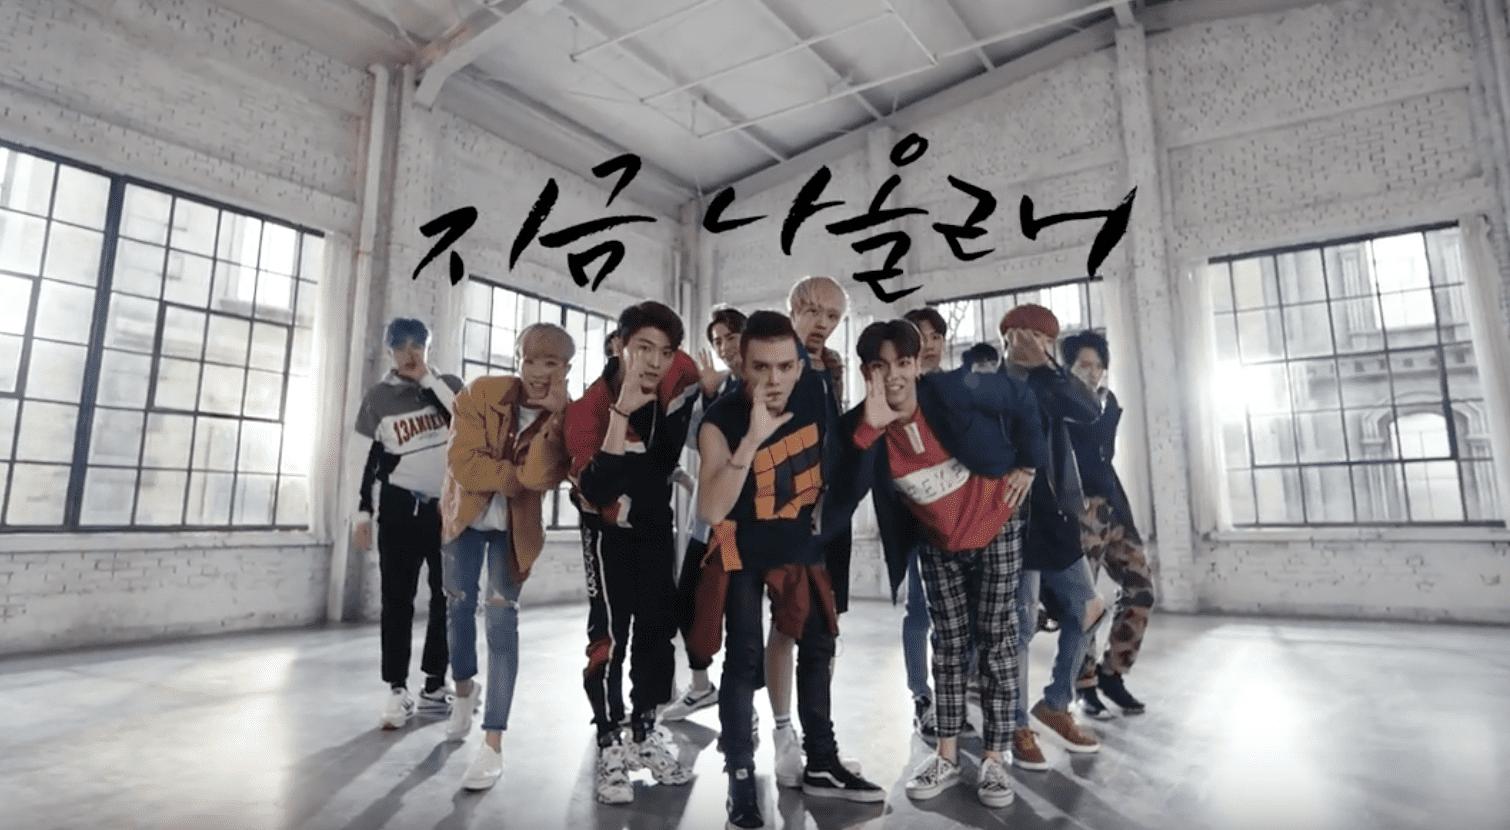 Watch: VARSITY Drops Fresh MV Teaser For October Comeback